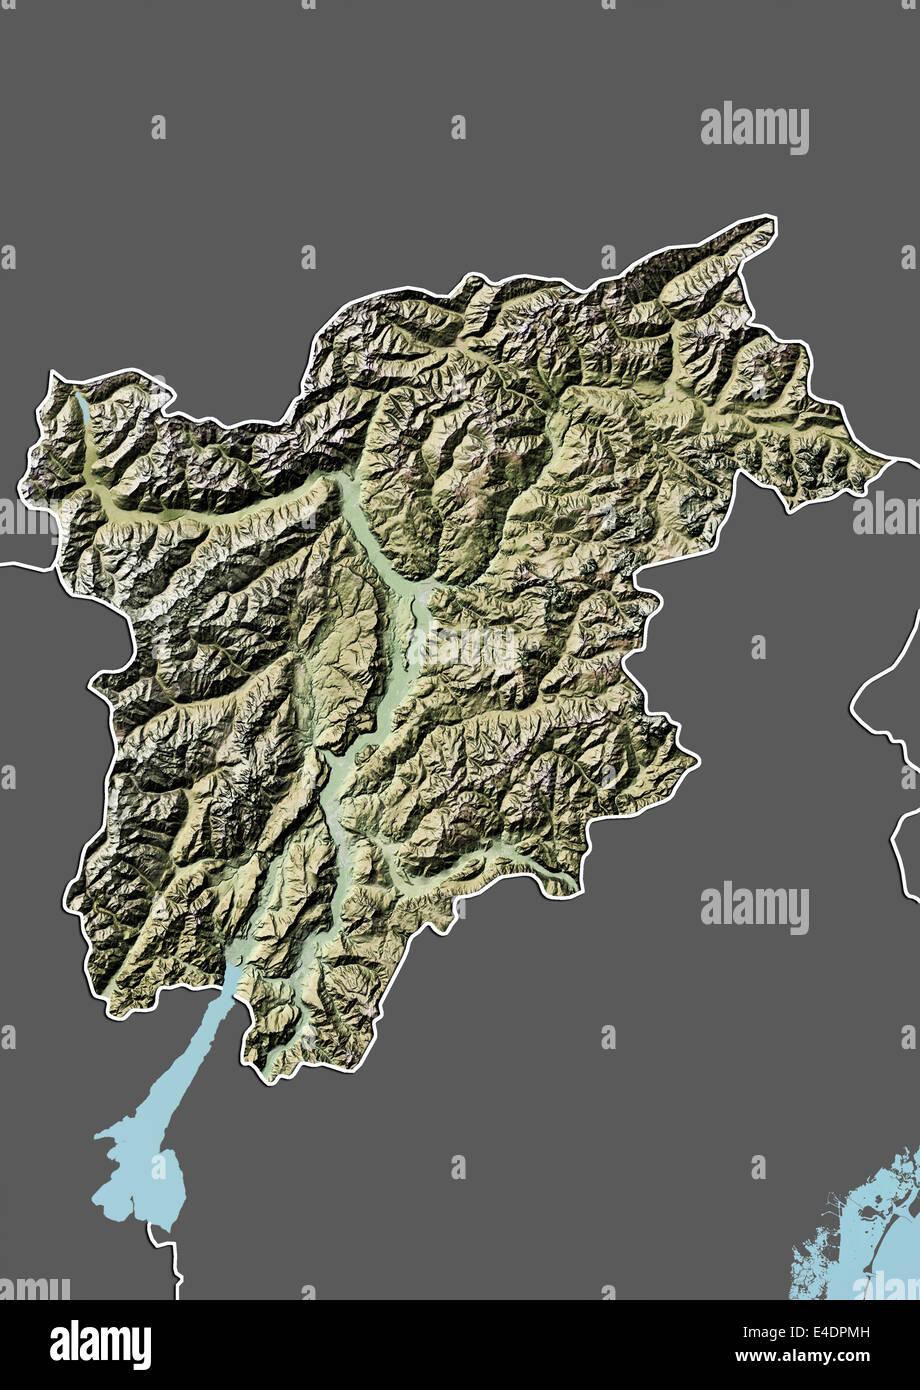 Cartina Italia Trentino Alto Adige.Region Of Trentino Alto Adige Italy Relief Map Stock Photo Alamy